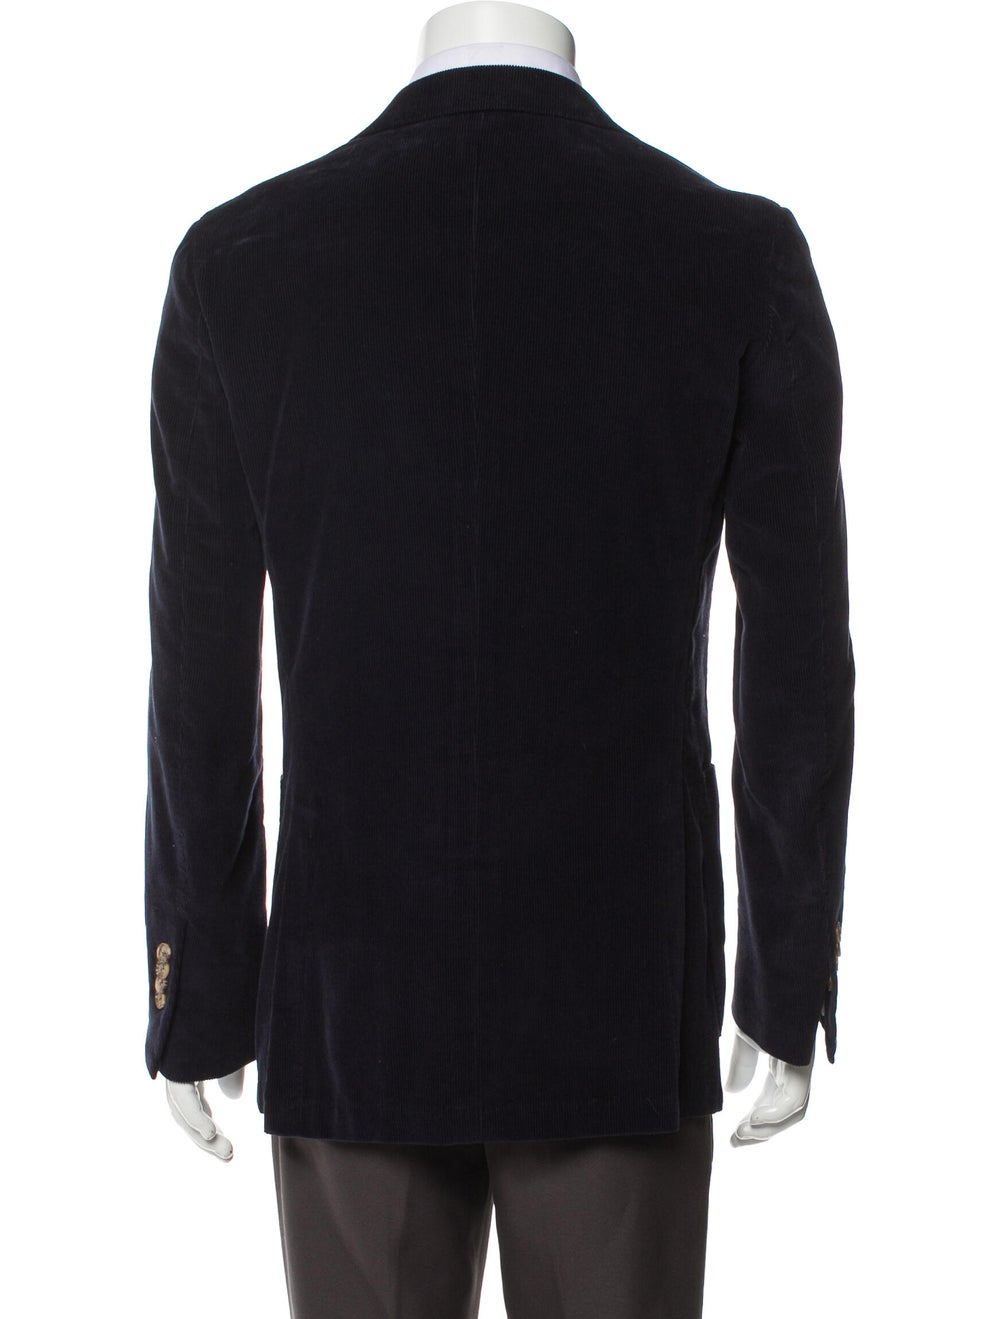 Suitsupply Sport Coat Blue - image 3